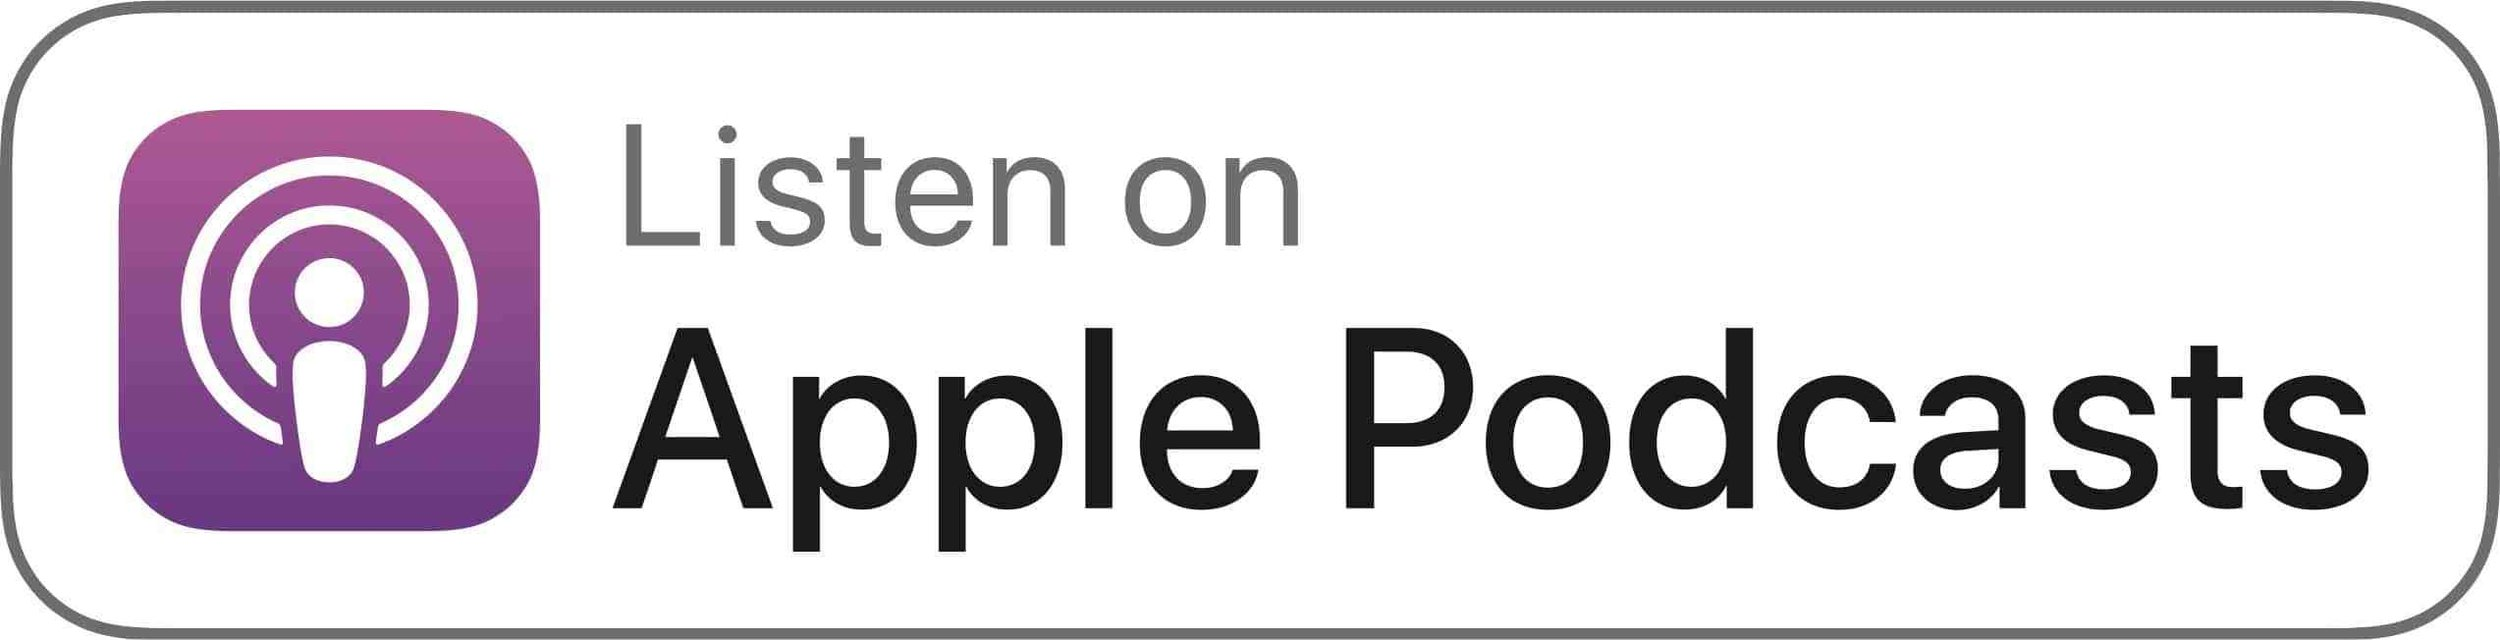 Listen-on-iTunes-Podcast-Apple-Podcast-App.jpg